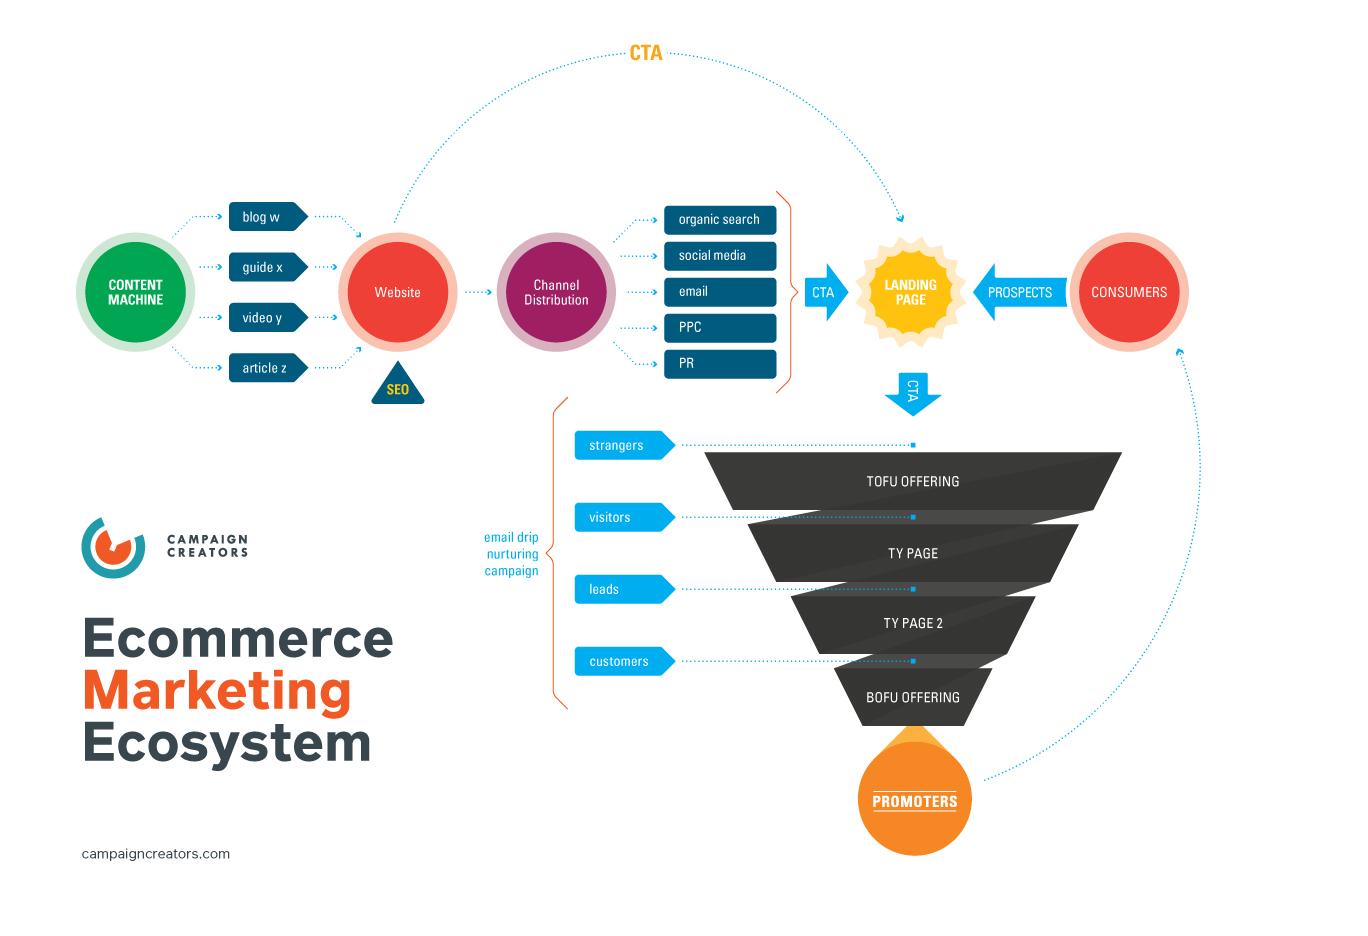 CC_EcommerceMarketingEcosystem